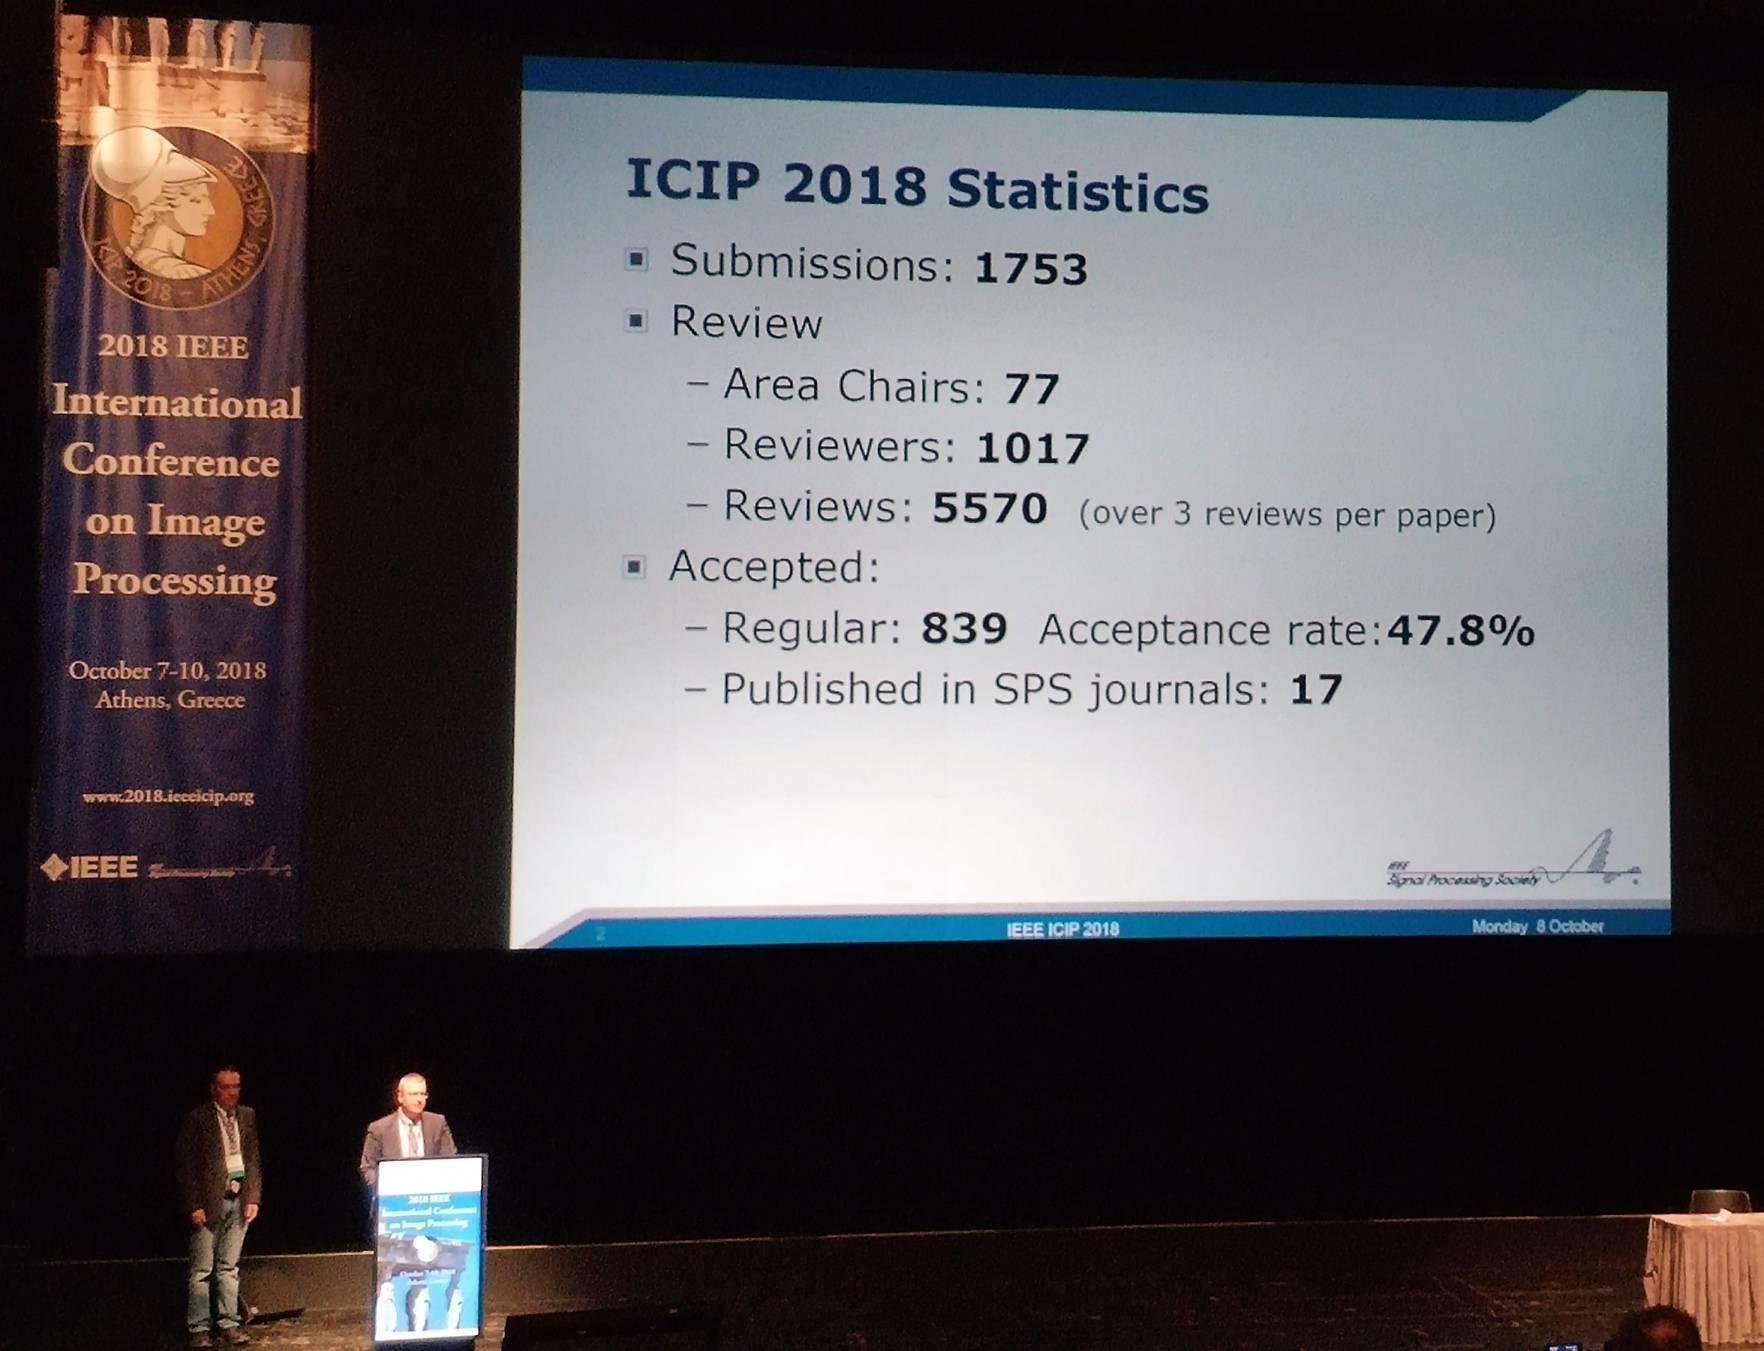 ICIP 2018 Statistics